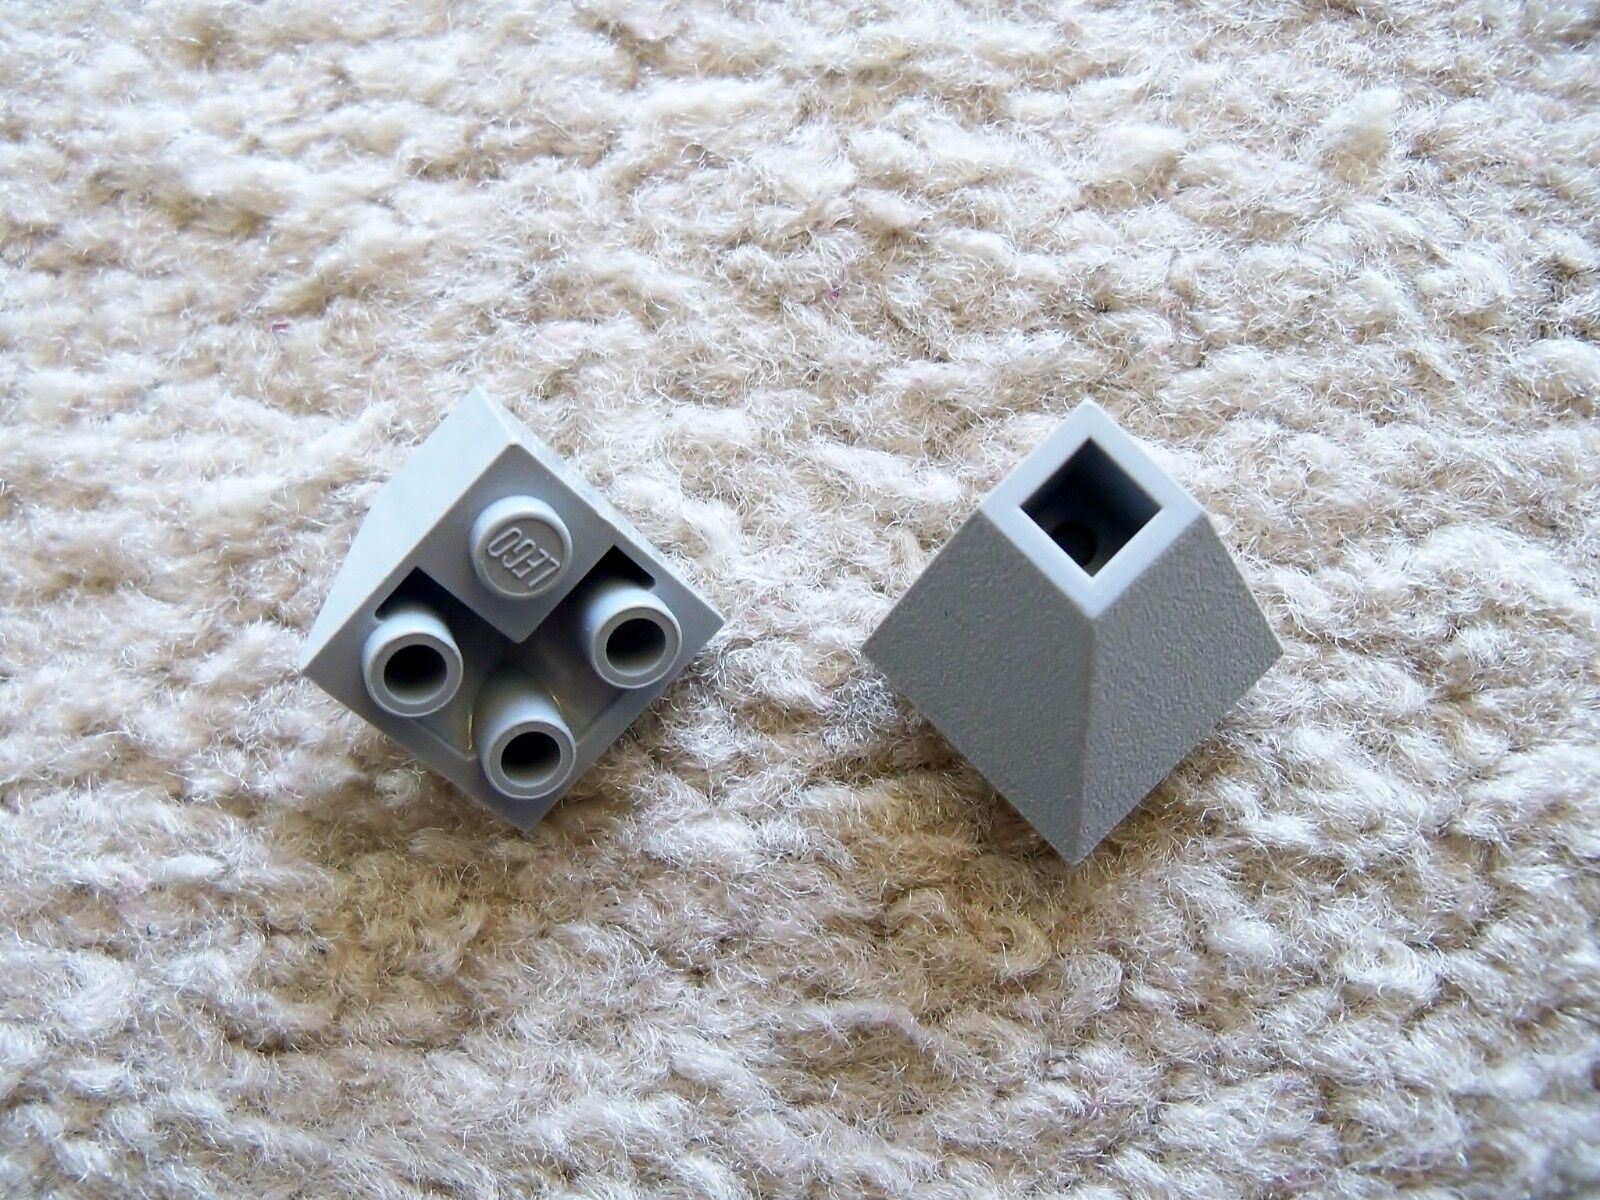 Lego Star Wars Selten 2 Blau Grau Hang Umgekehrt 45 2 X 2 Doppel Konvex - 10030